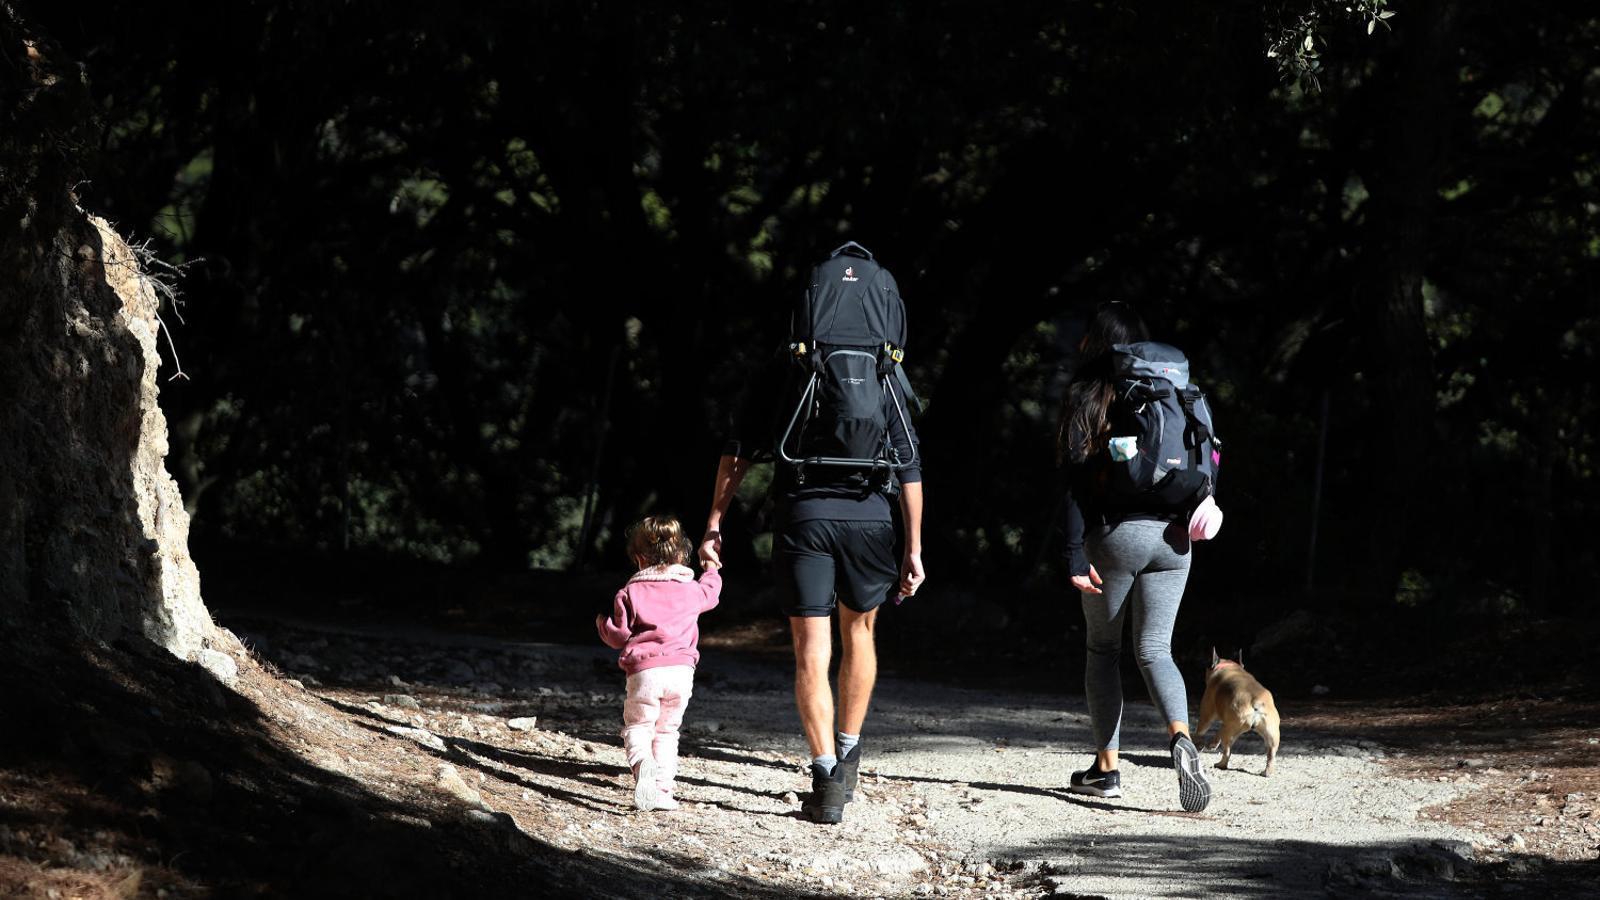 Excursionistes de diumenge, la gran aventura